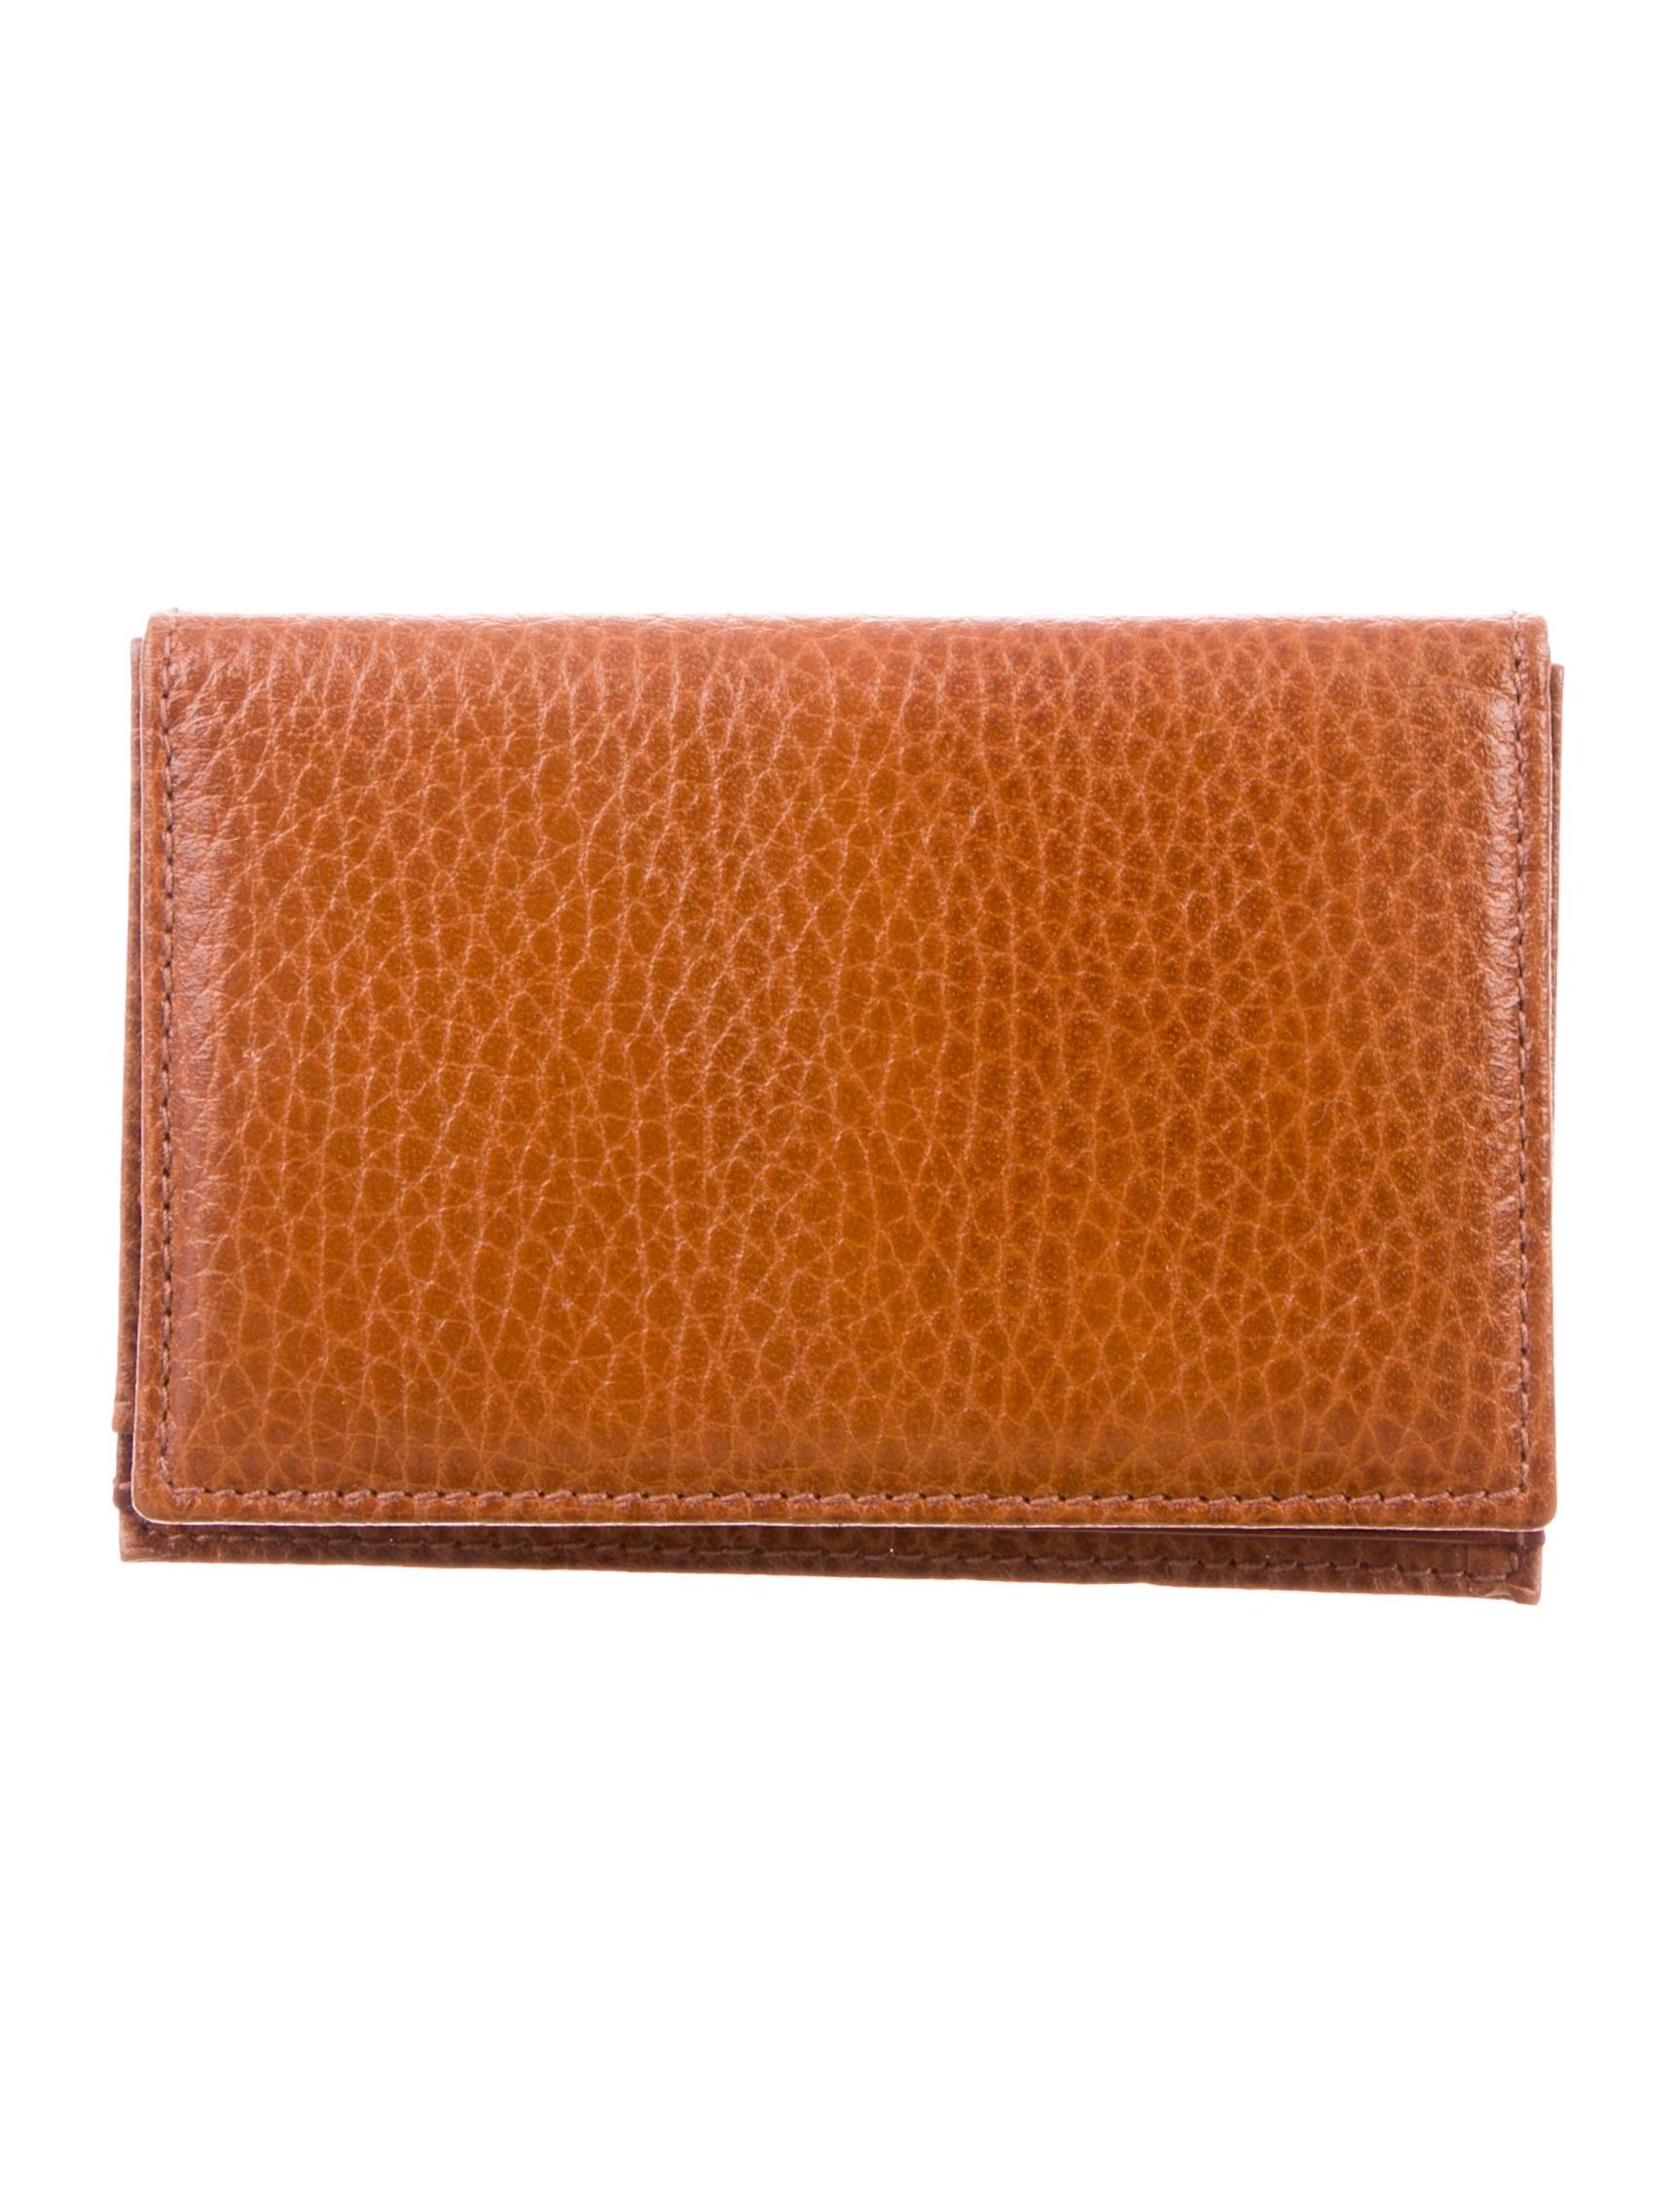 leather bifold card holder - Bifold Card Holder